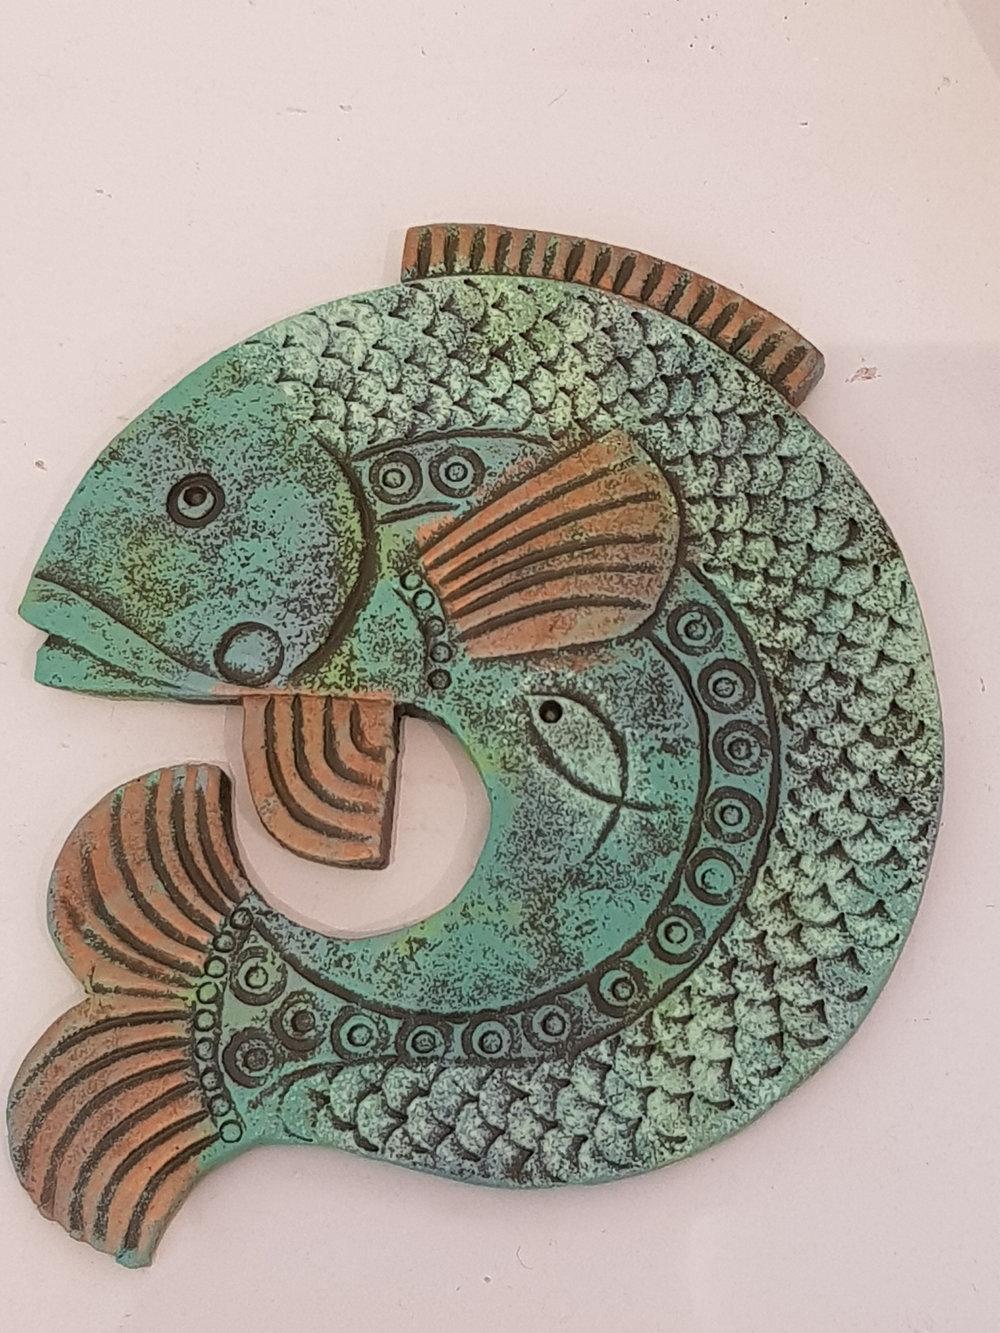 Fish Tile no 9 #3214.jpg